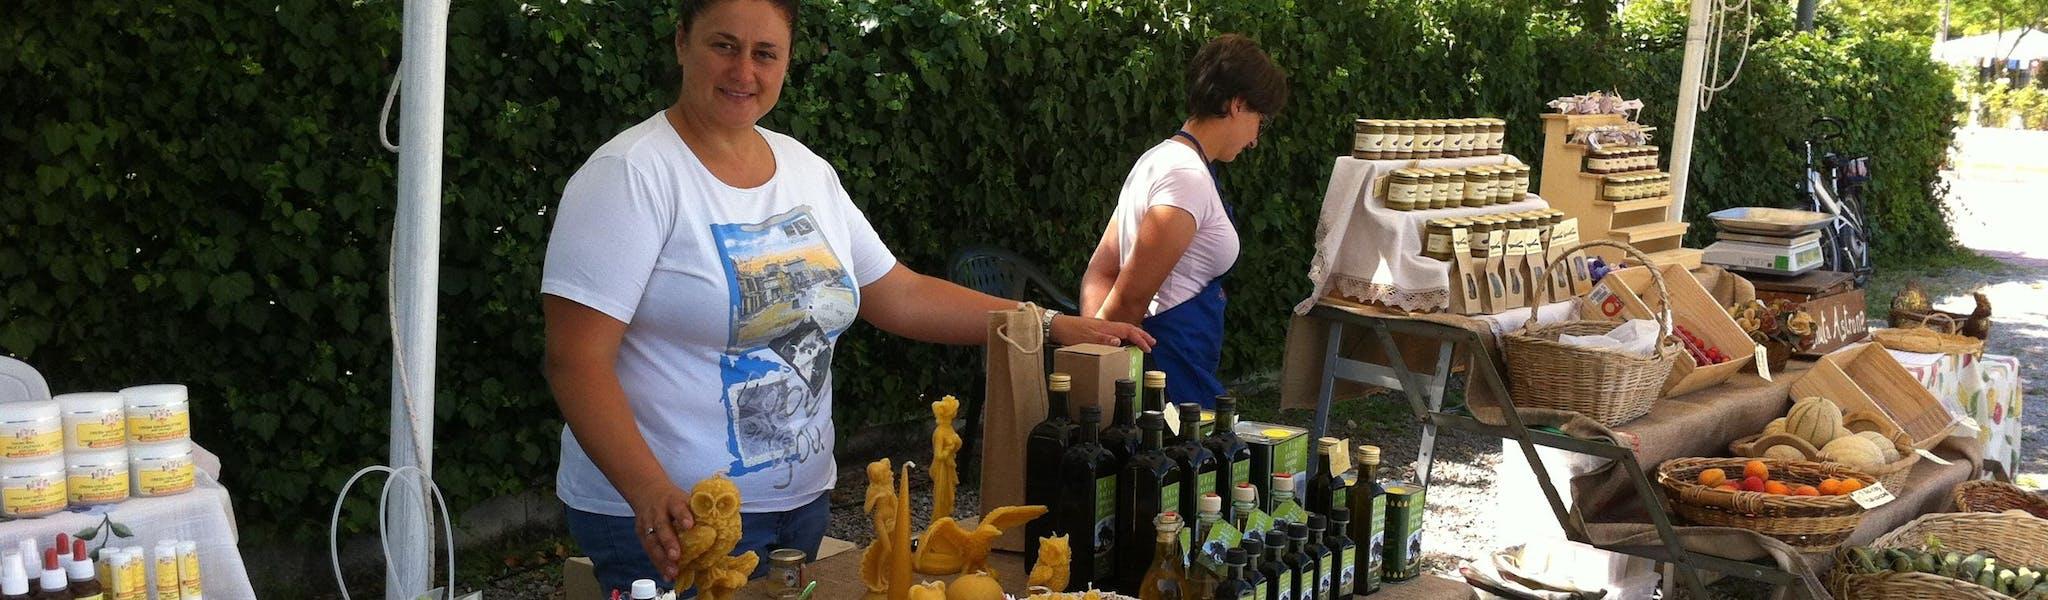 Markt op camping Parco delle Piscine